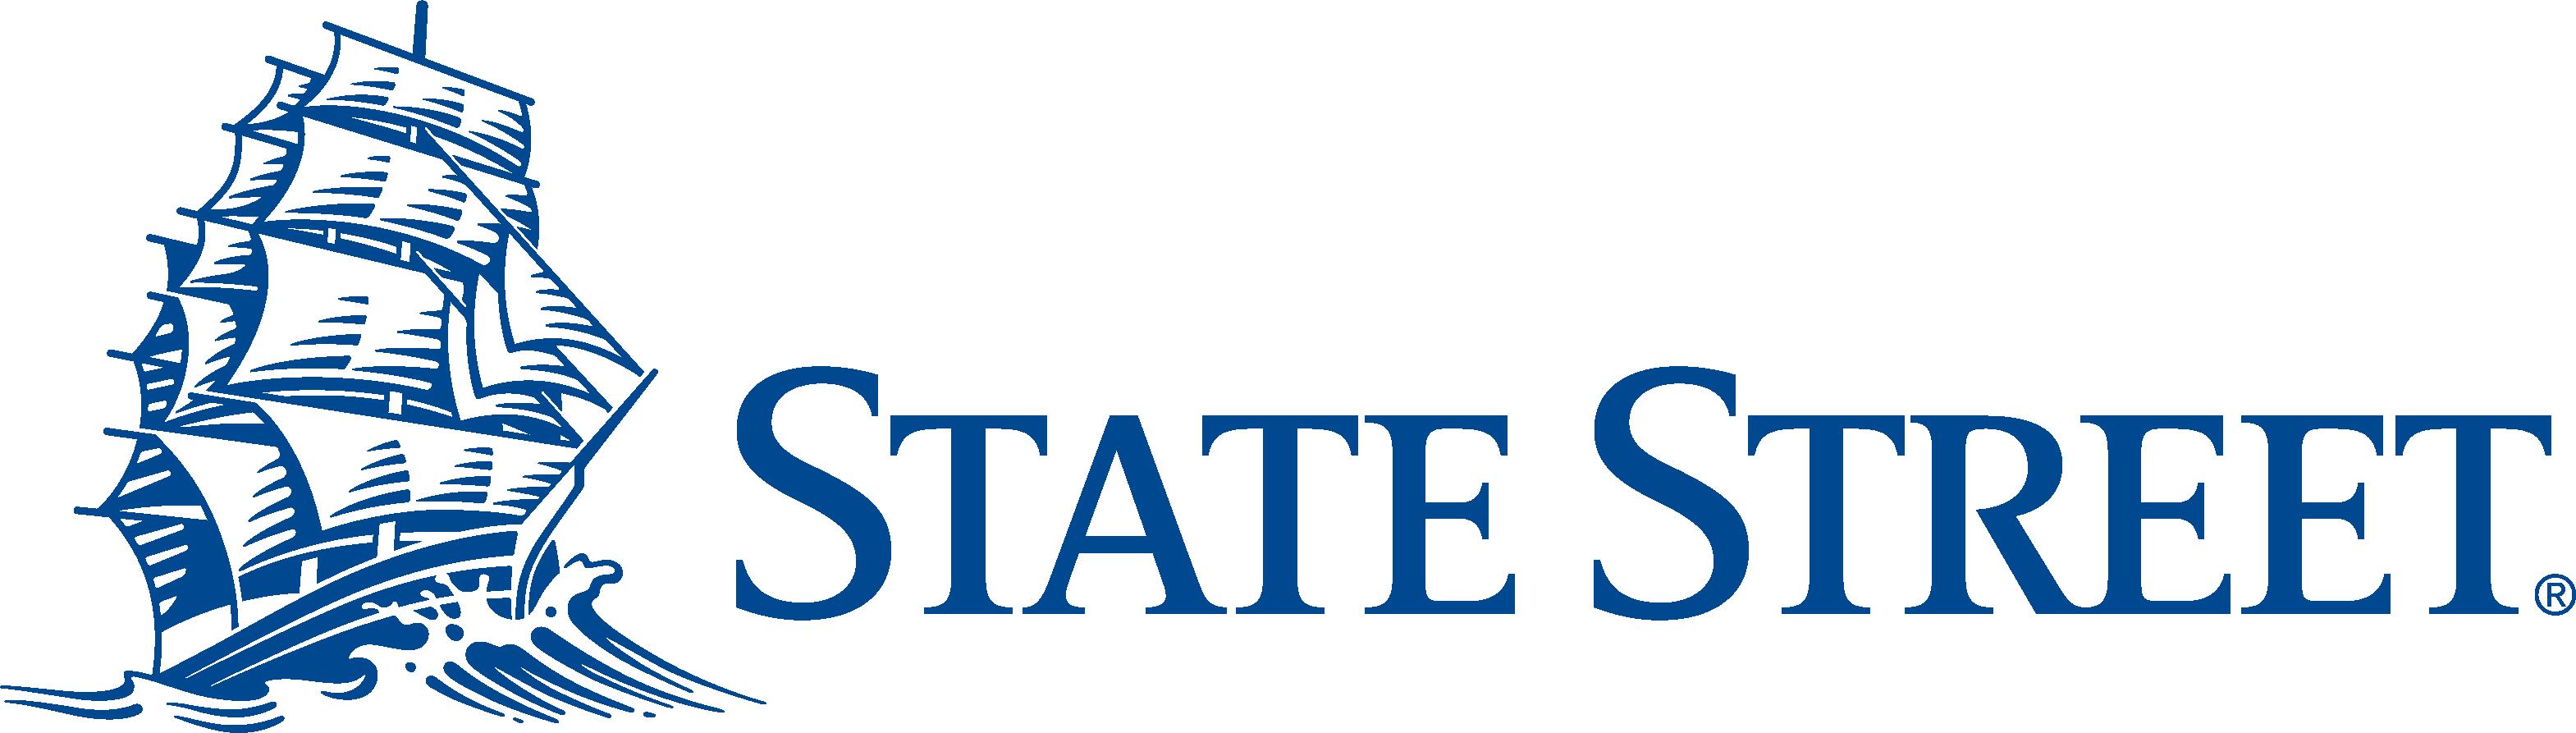 Банк - State Street Corporation